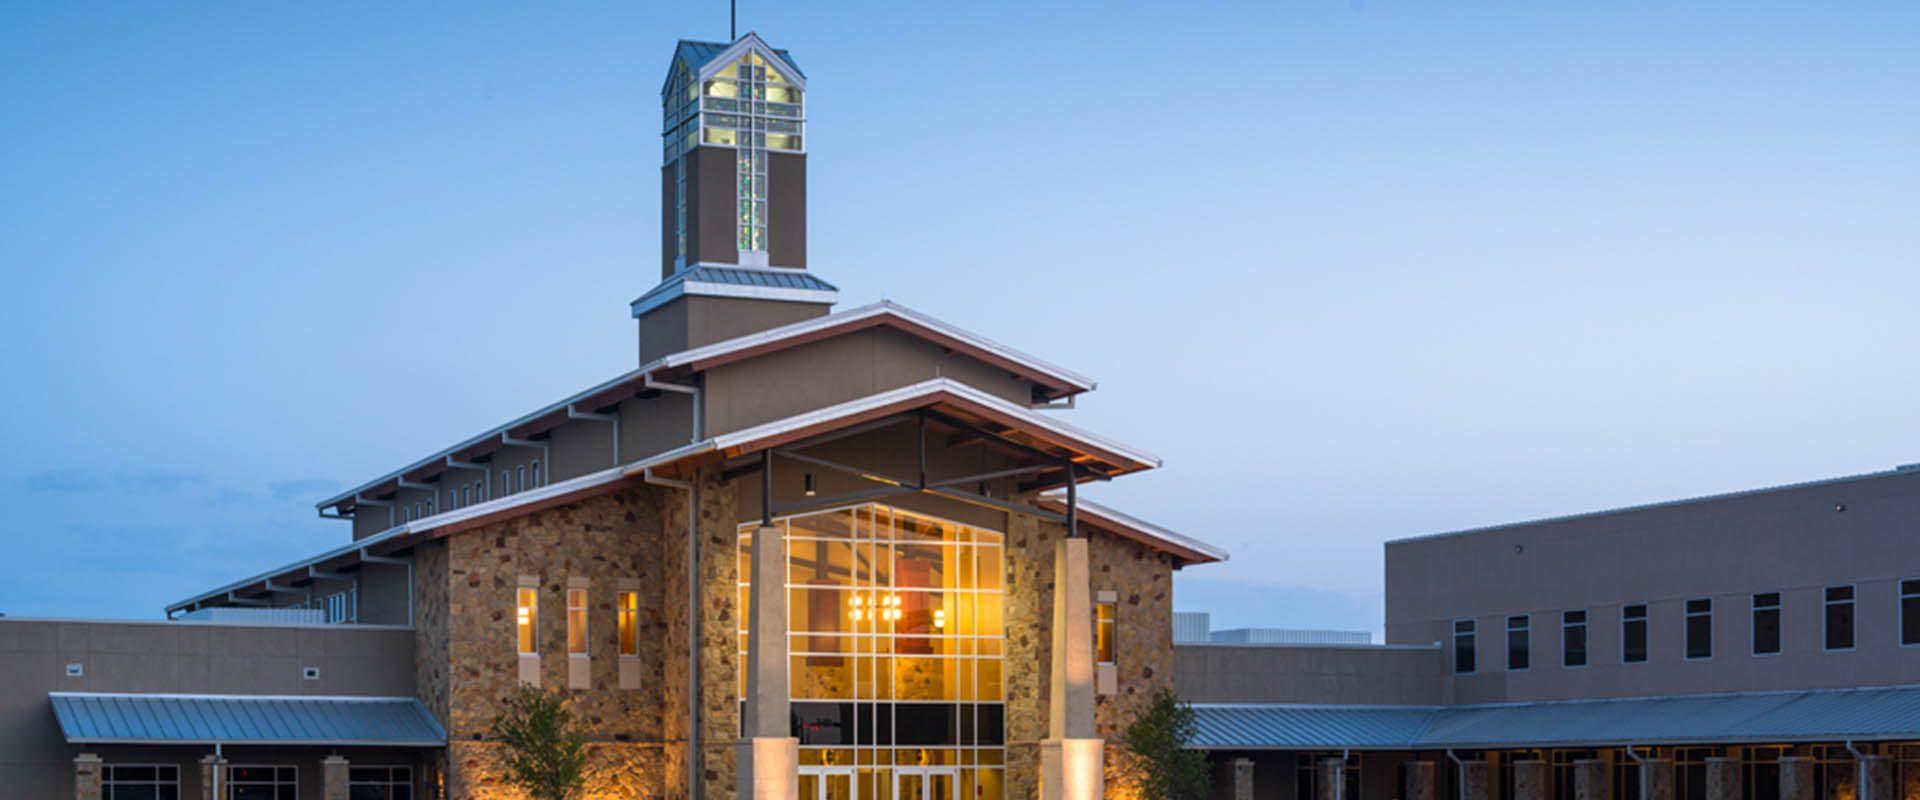 Grace Ave United Methodist Church, Frisco, TX